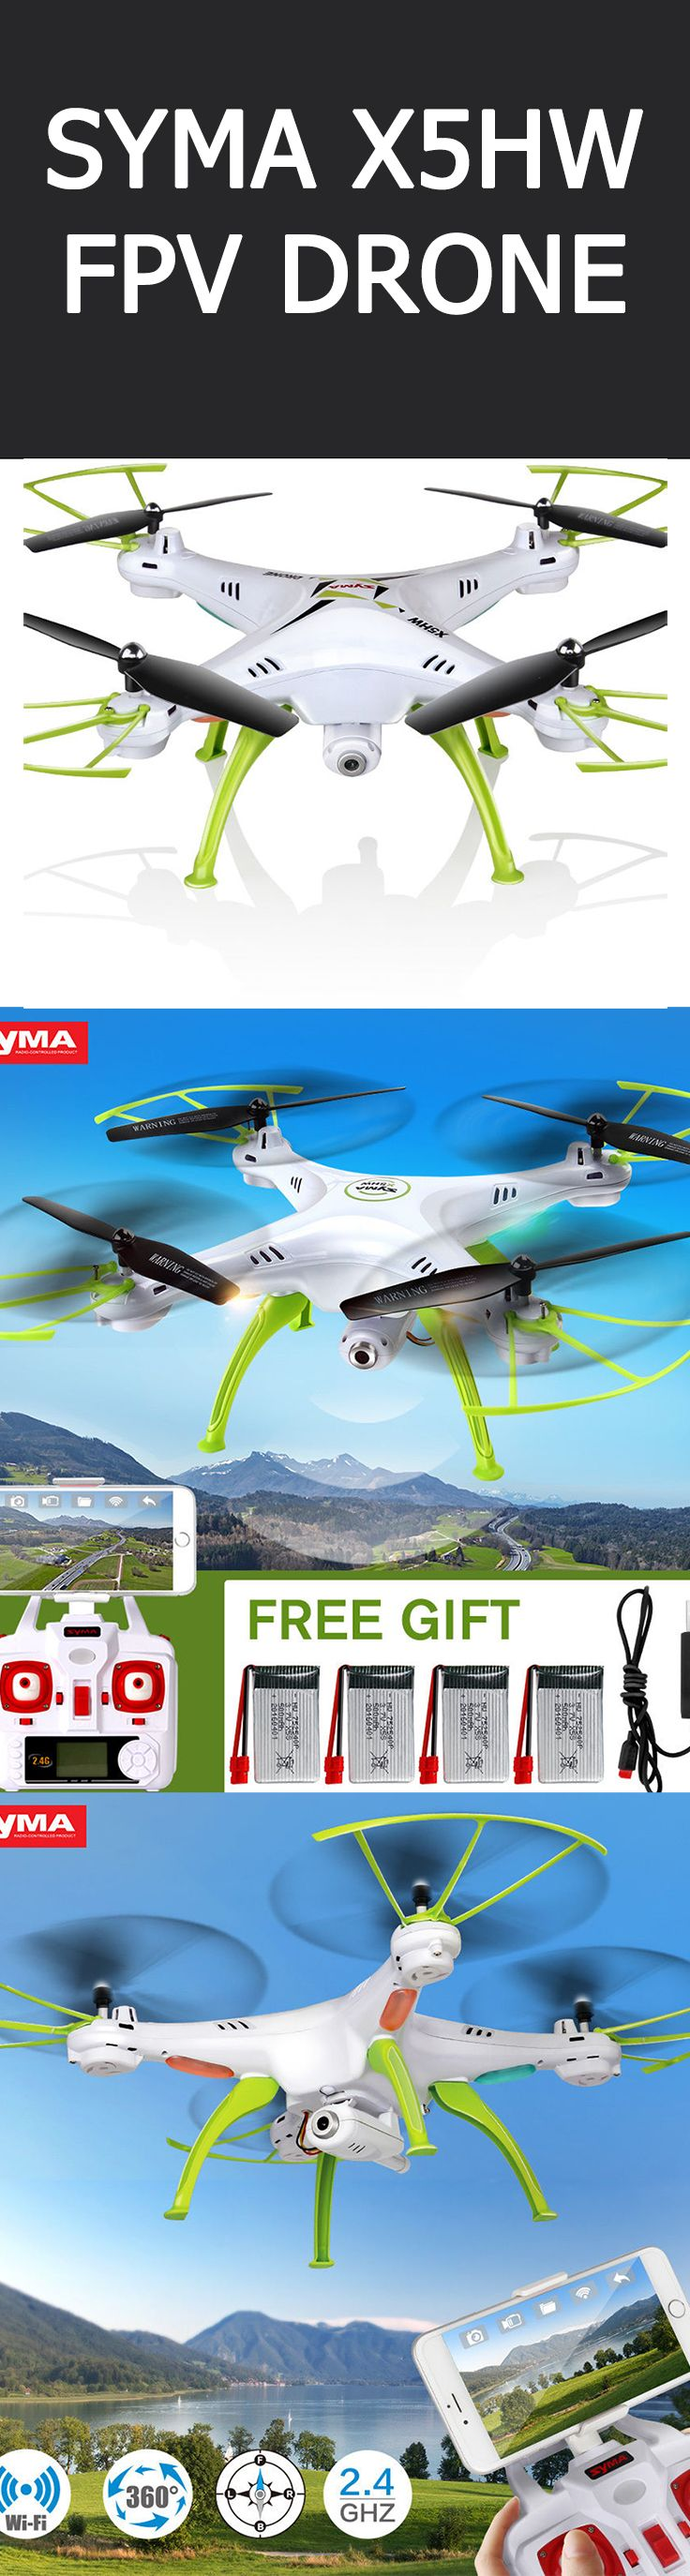 The 3297 best Quads images on Pinterest   Drones, Technology gadgets ...